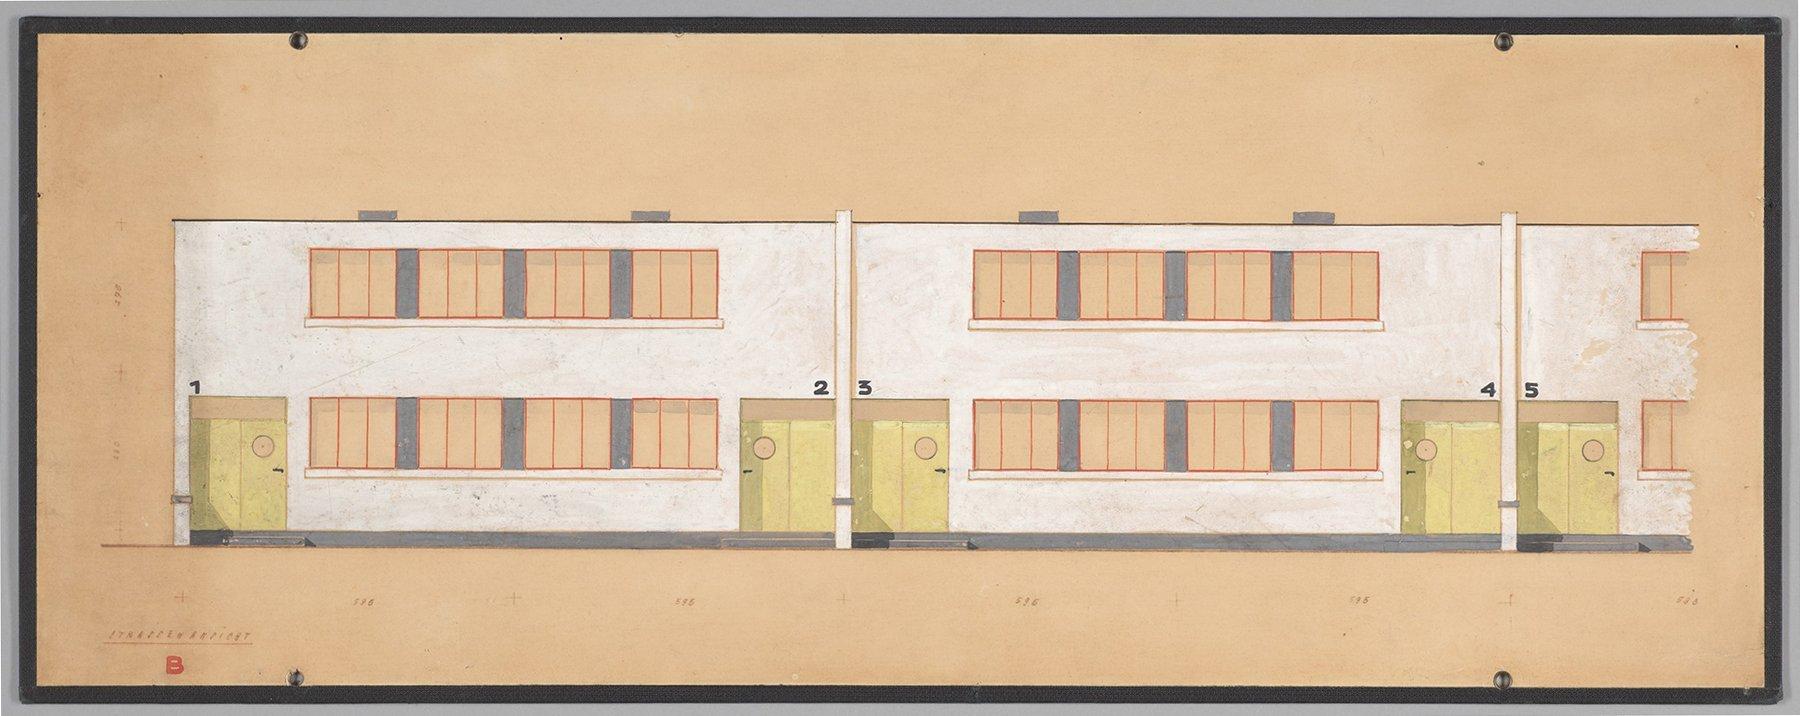 Farbkonzept Fassade Toerten, gelbe Türen